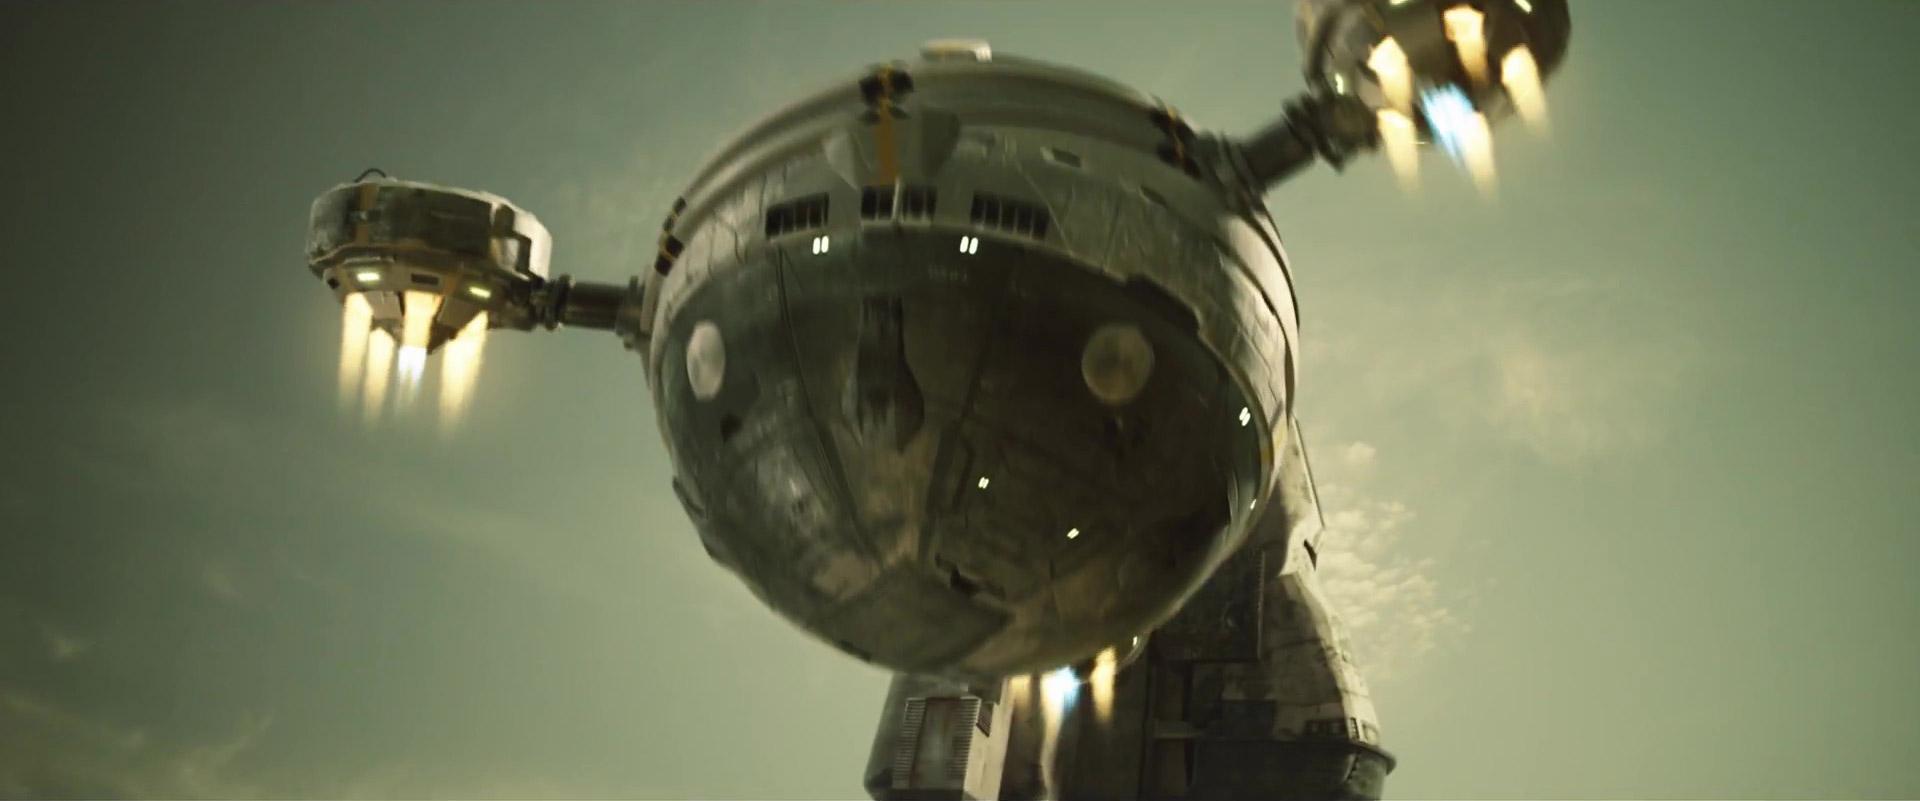 half-life-scifi-movie-trailer